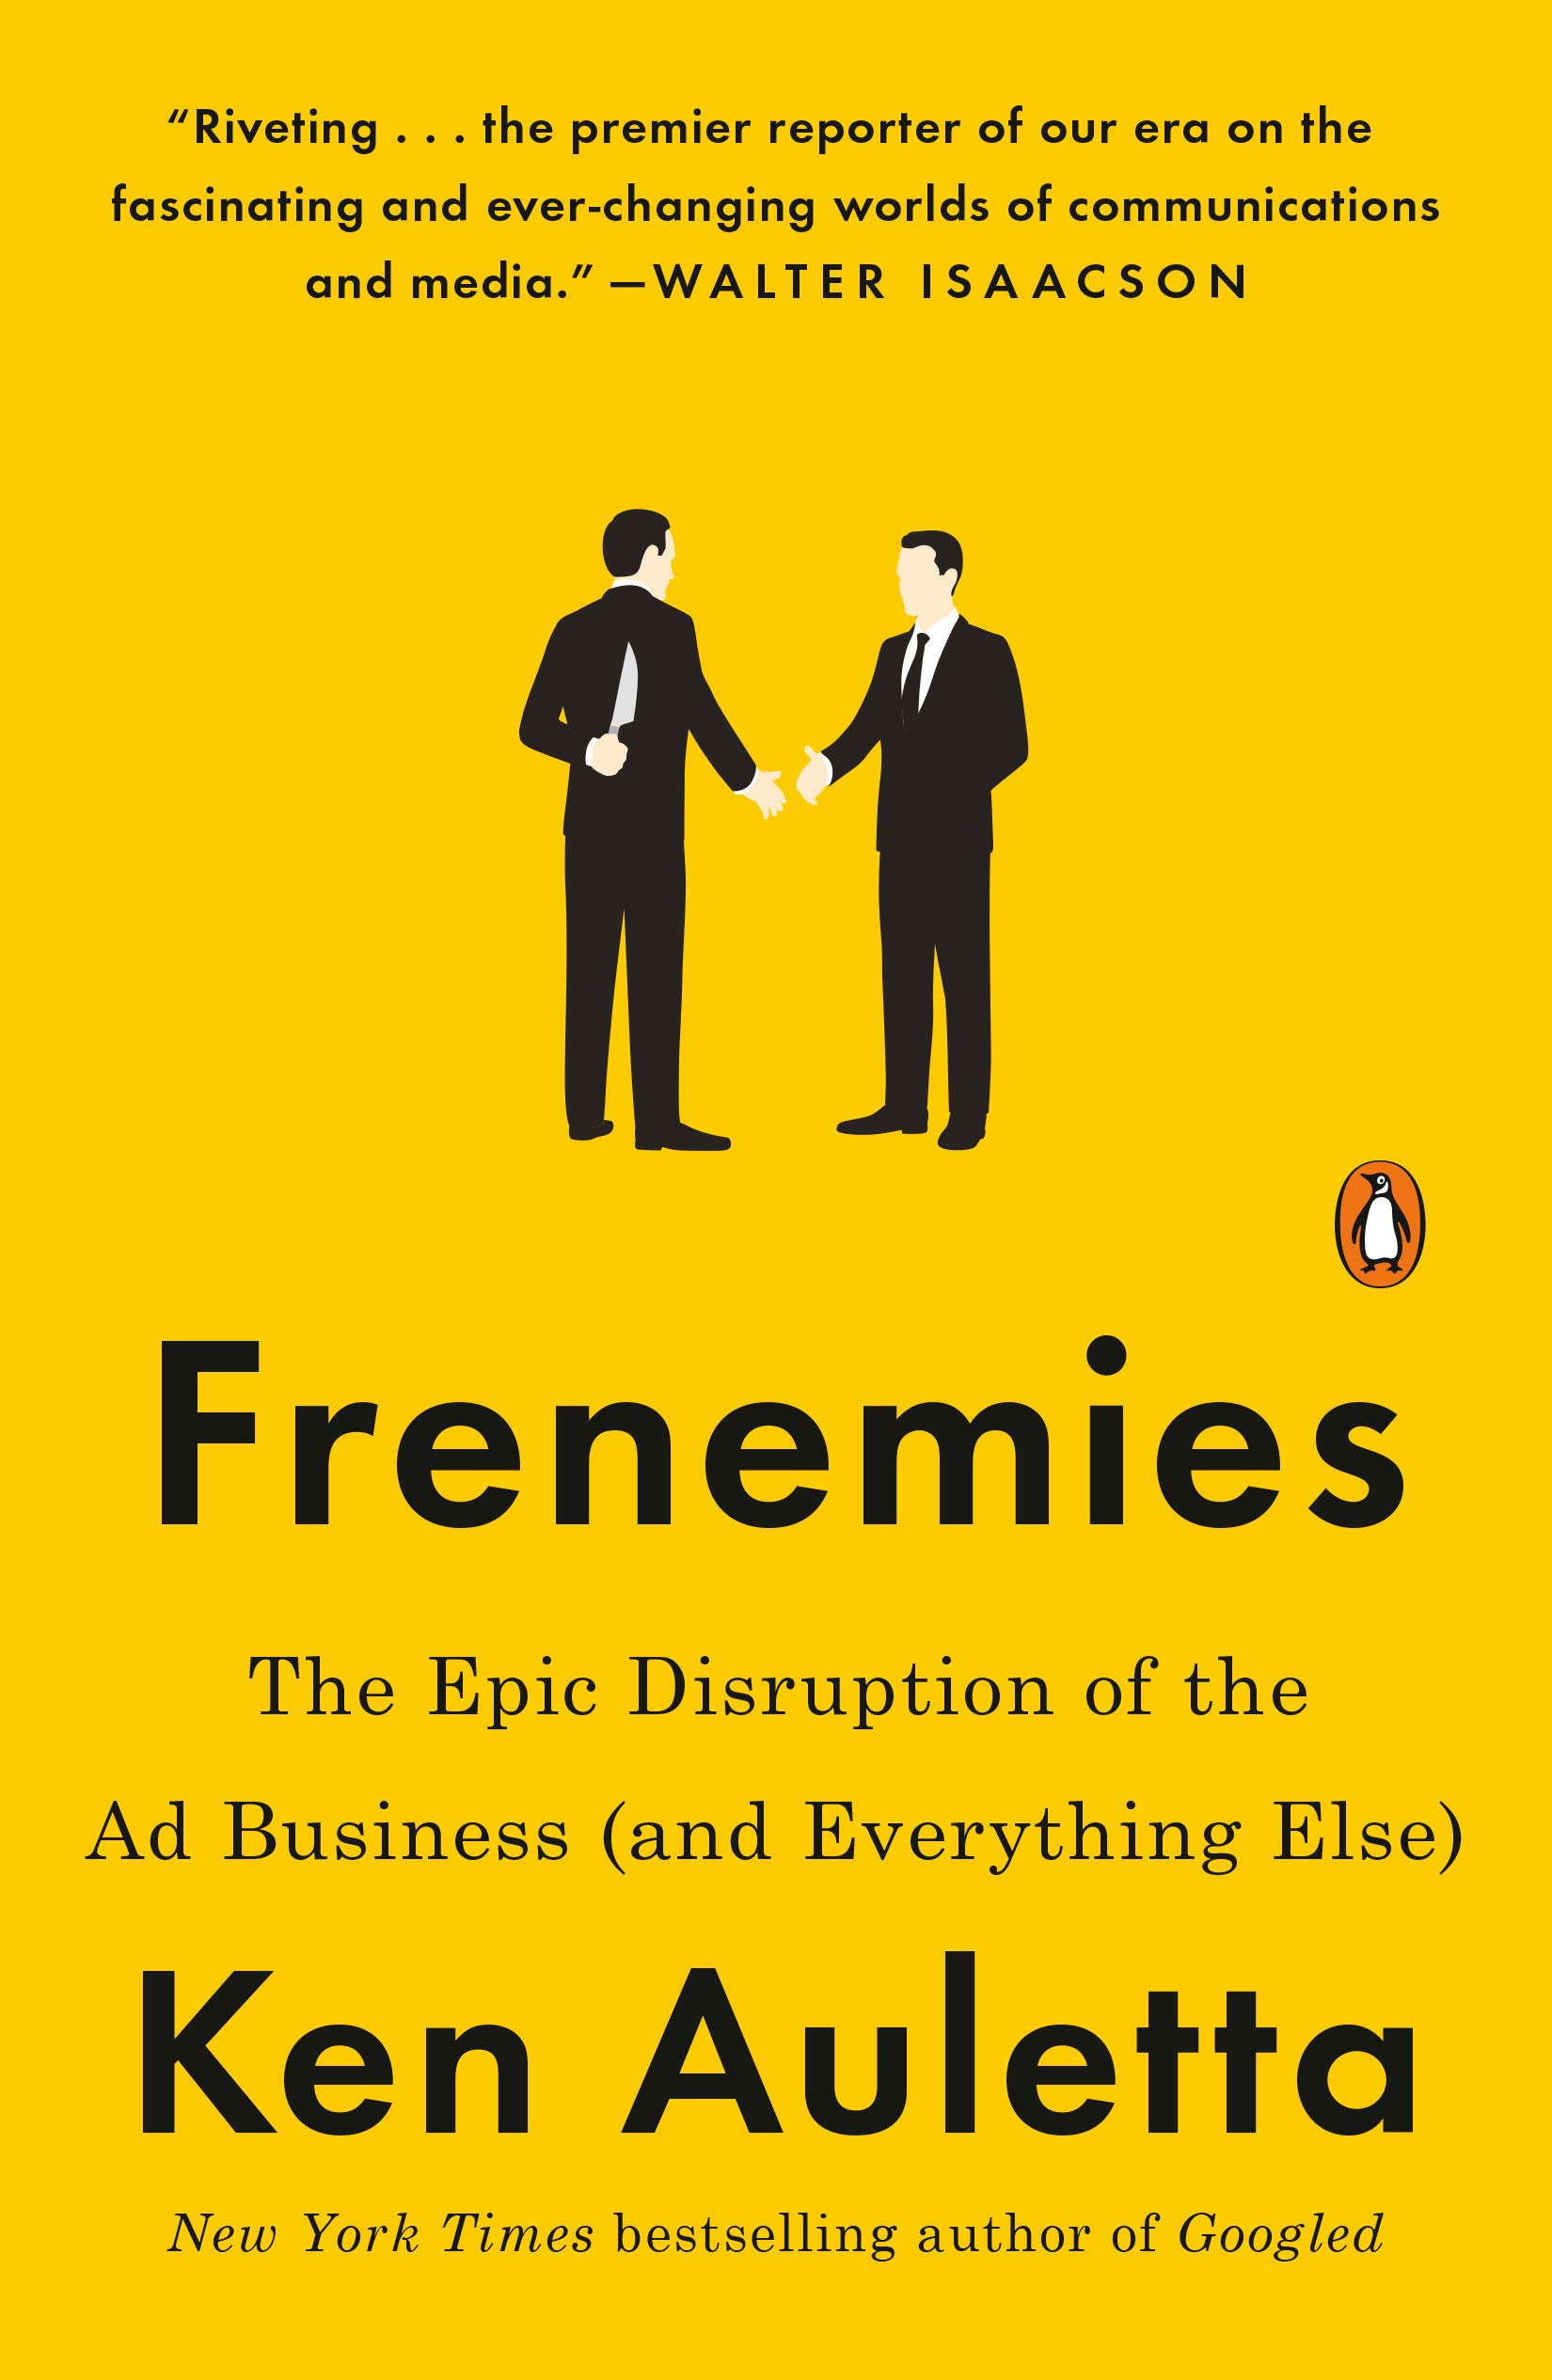 Frenemies: The Epic Disruption of the Ad Business and Everything Else: Amazon.es: Ken Auletta: Libros en idiomas extranjeros